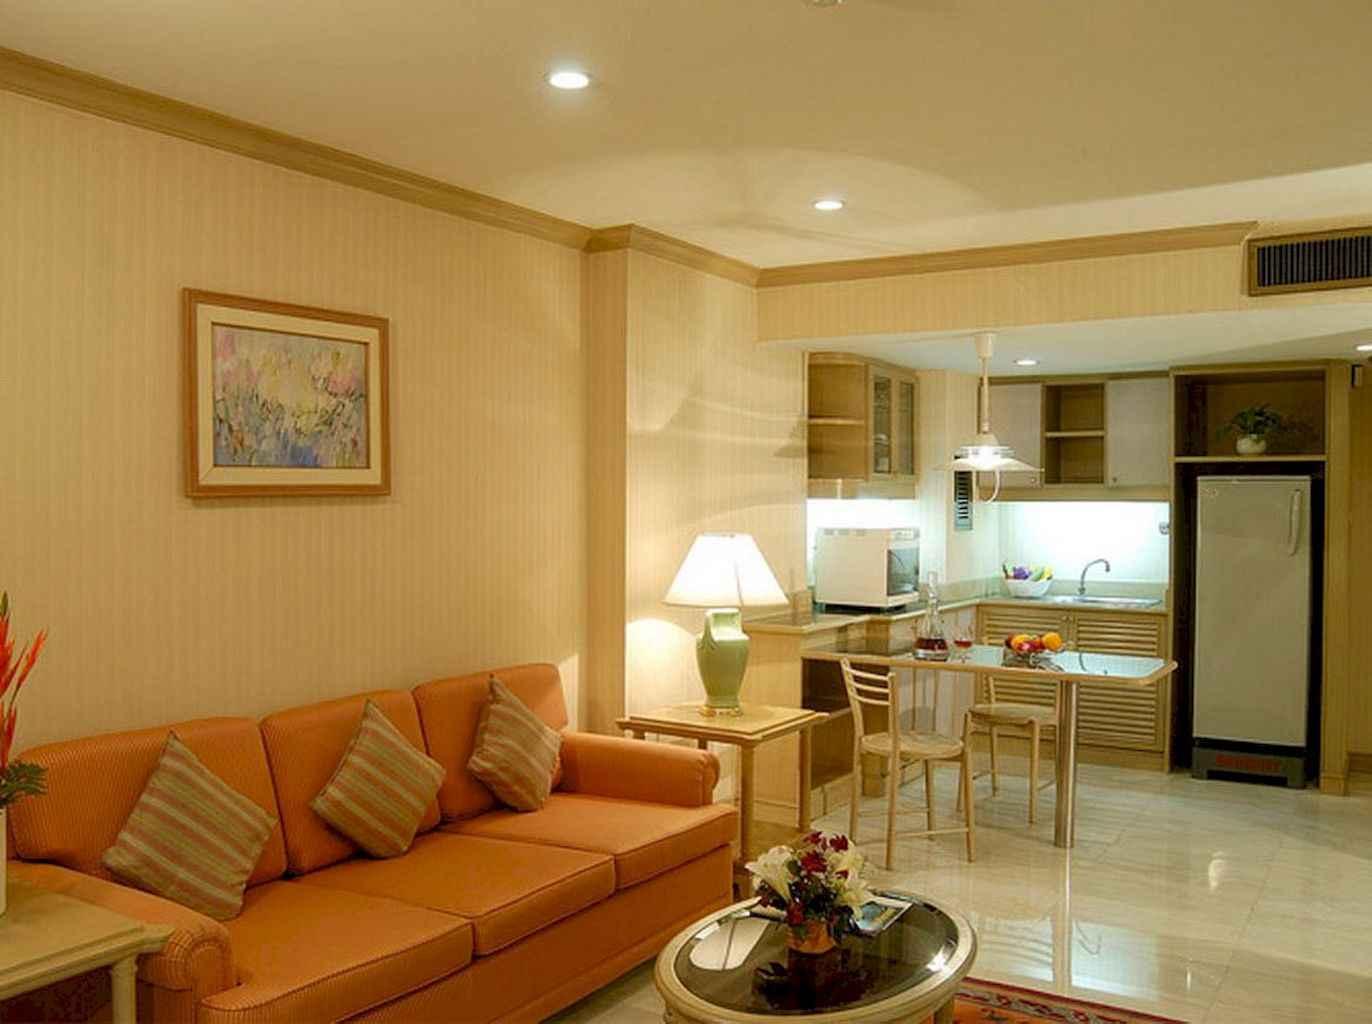 80 Elegant Harmony Interior Design Ideas For First Couple (44)